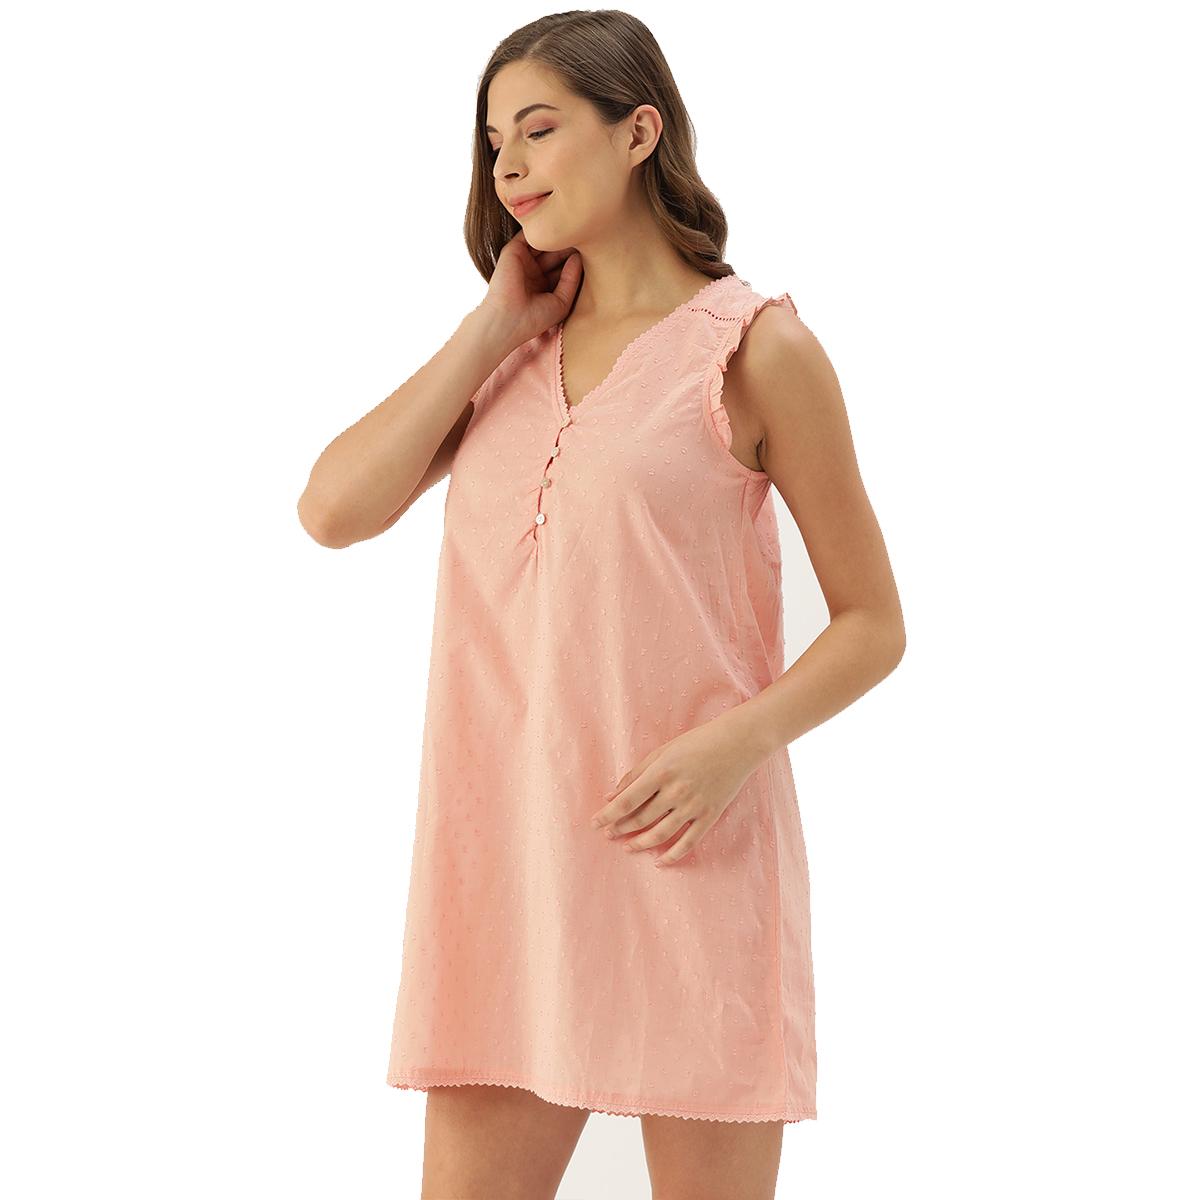 Slumber Jill Caira Rose Pink Dobby Self Design Night Dress with Straps